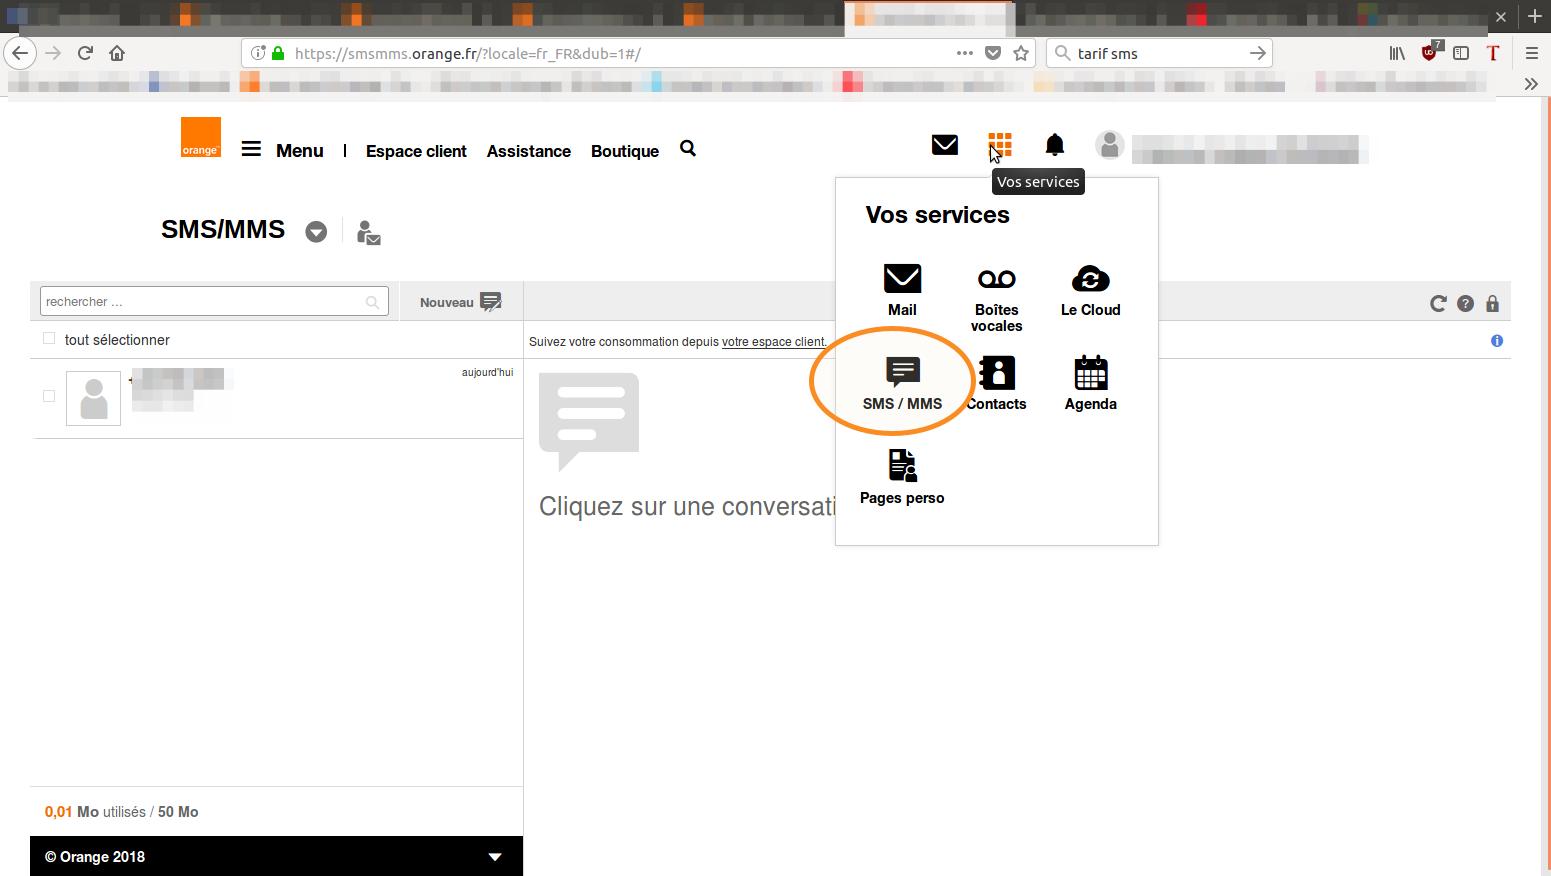 SMS-MMS Orange - Mozilla Firefox_734.png